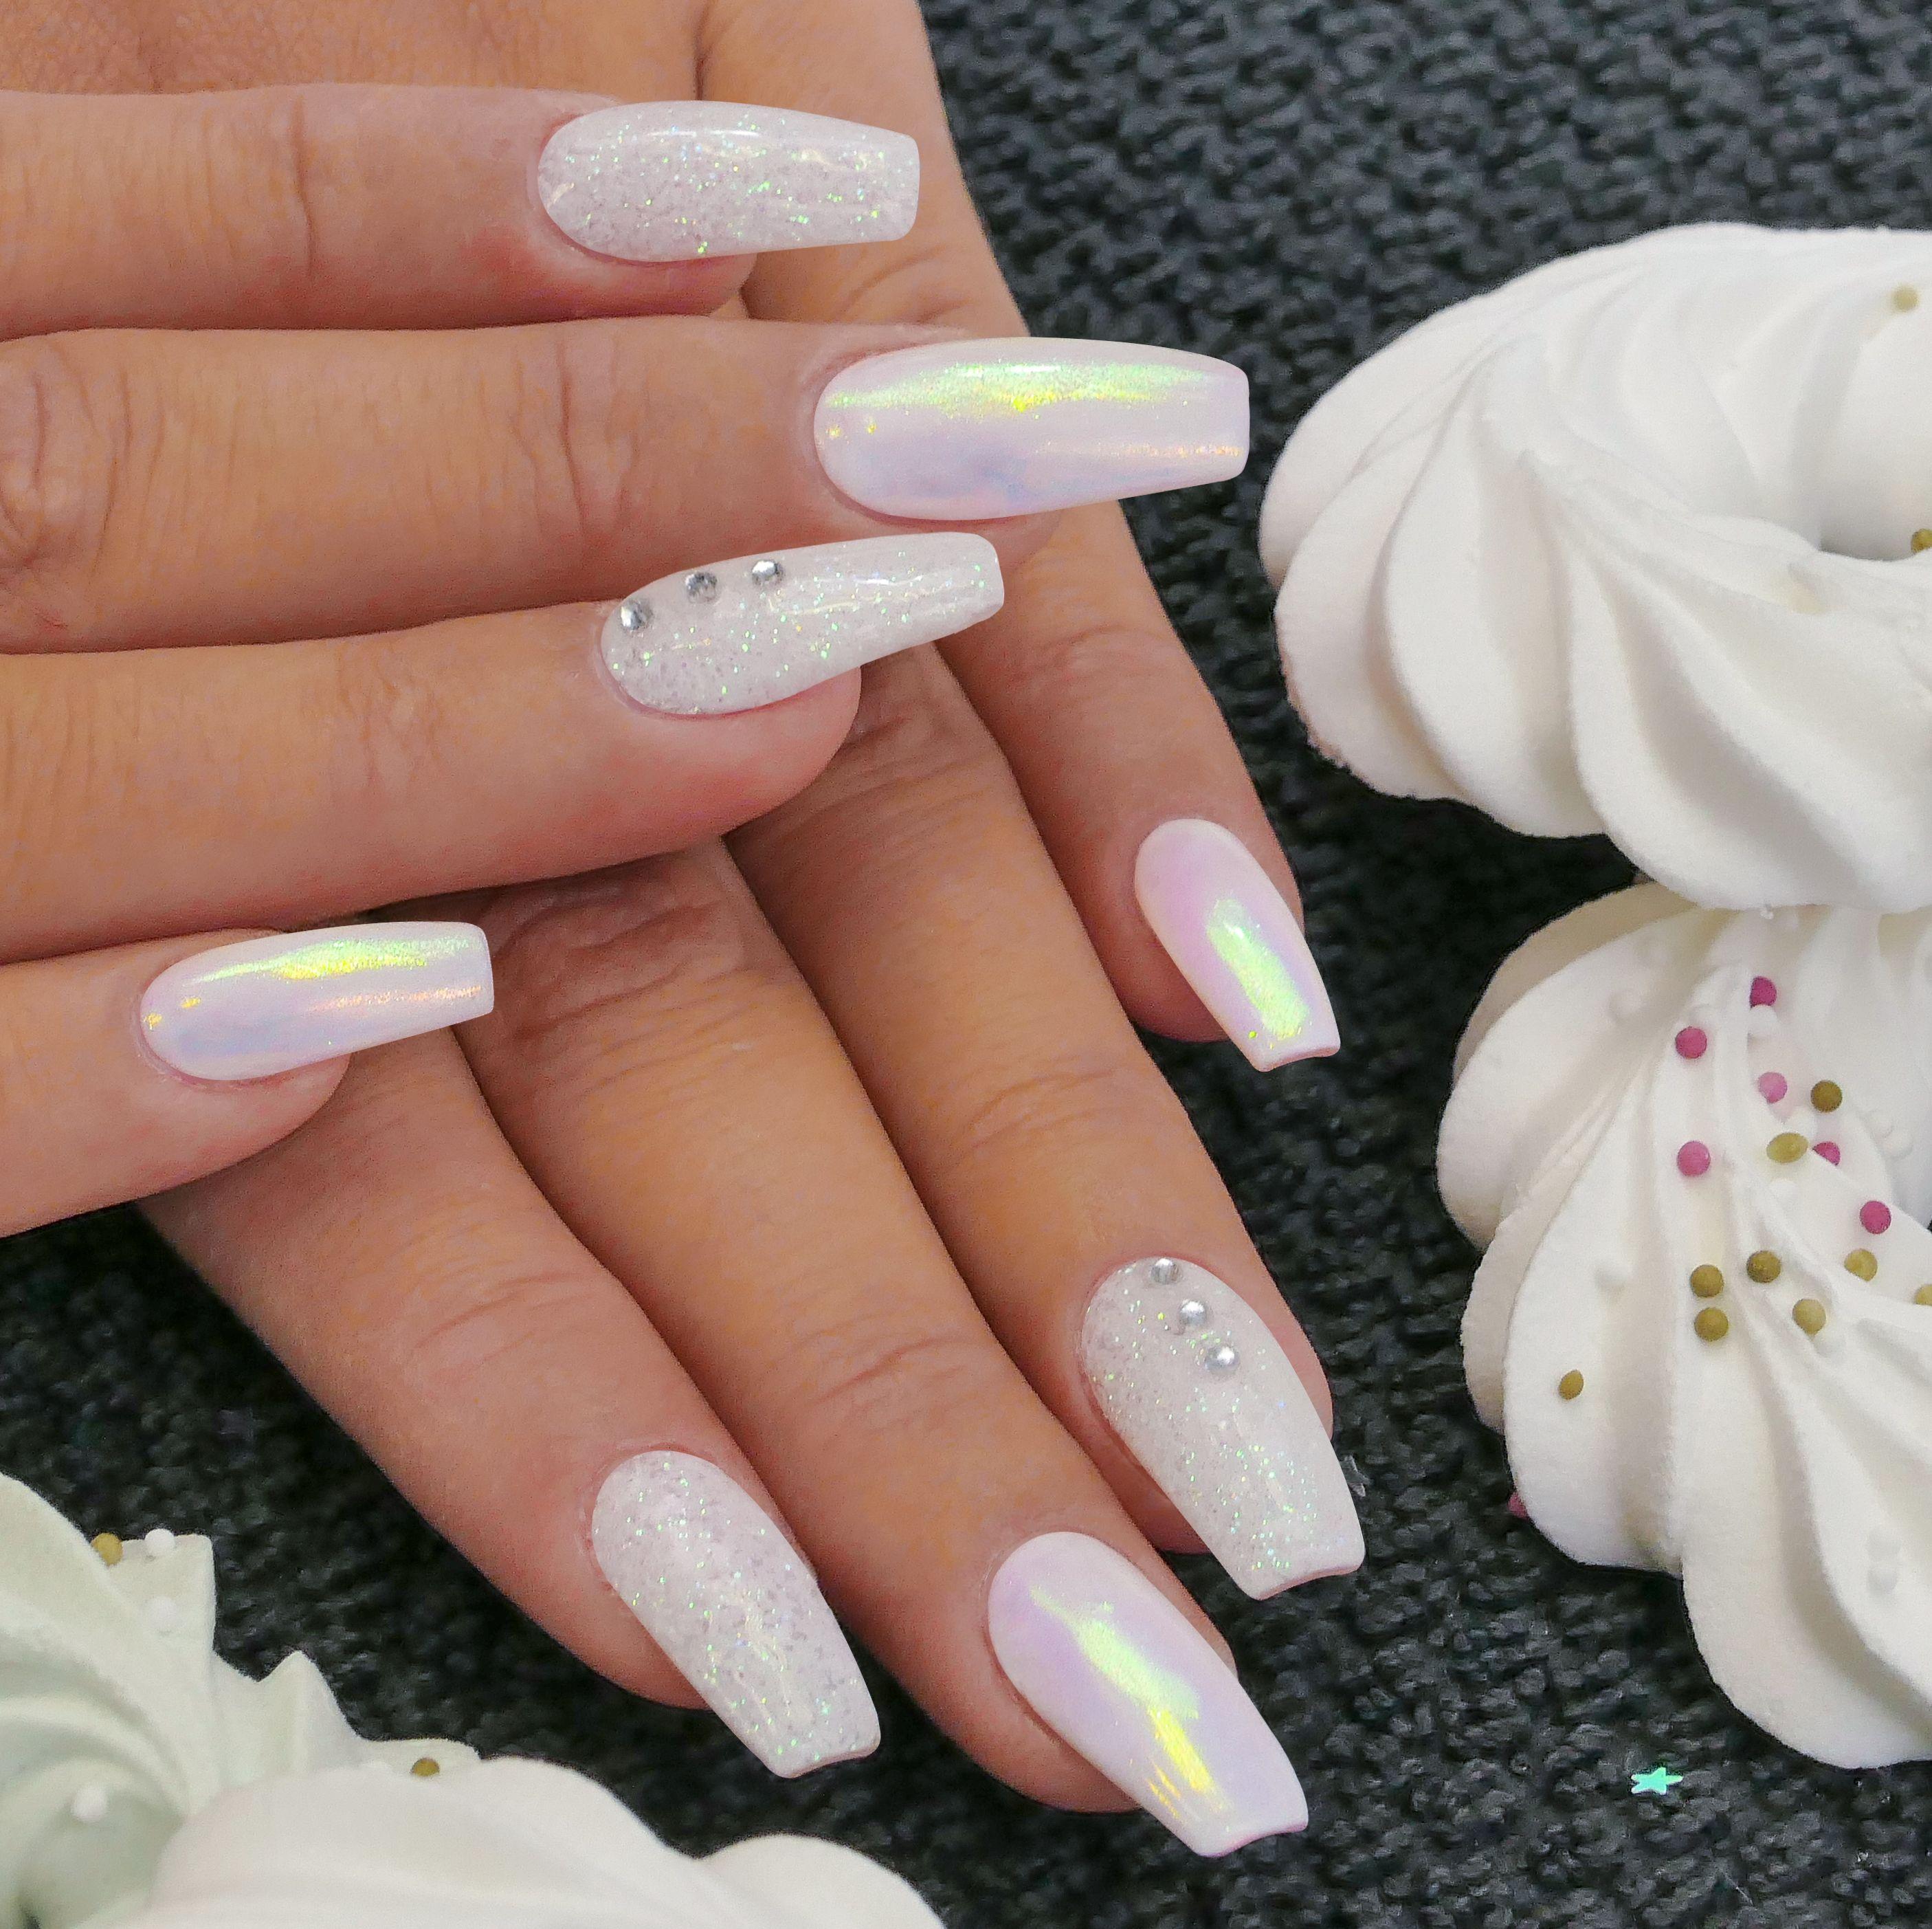 Neonail Lestici Pigment Pearl Effect Naninails Cz Gel Nails Nail Designs Nail Art